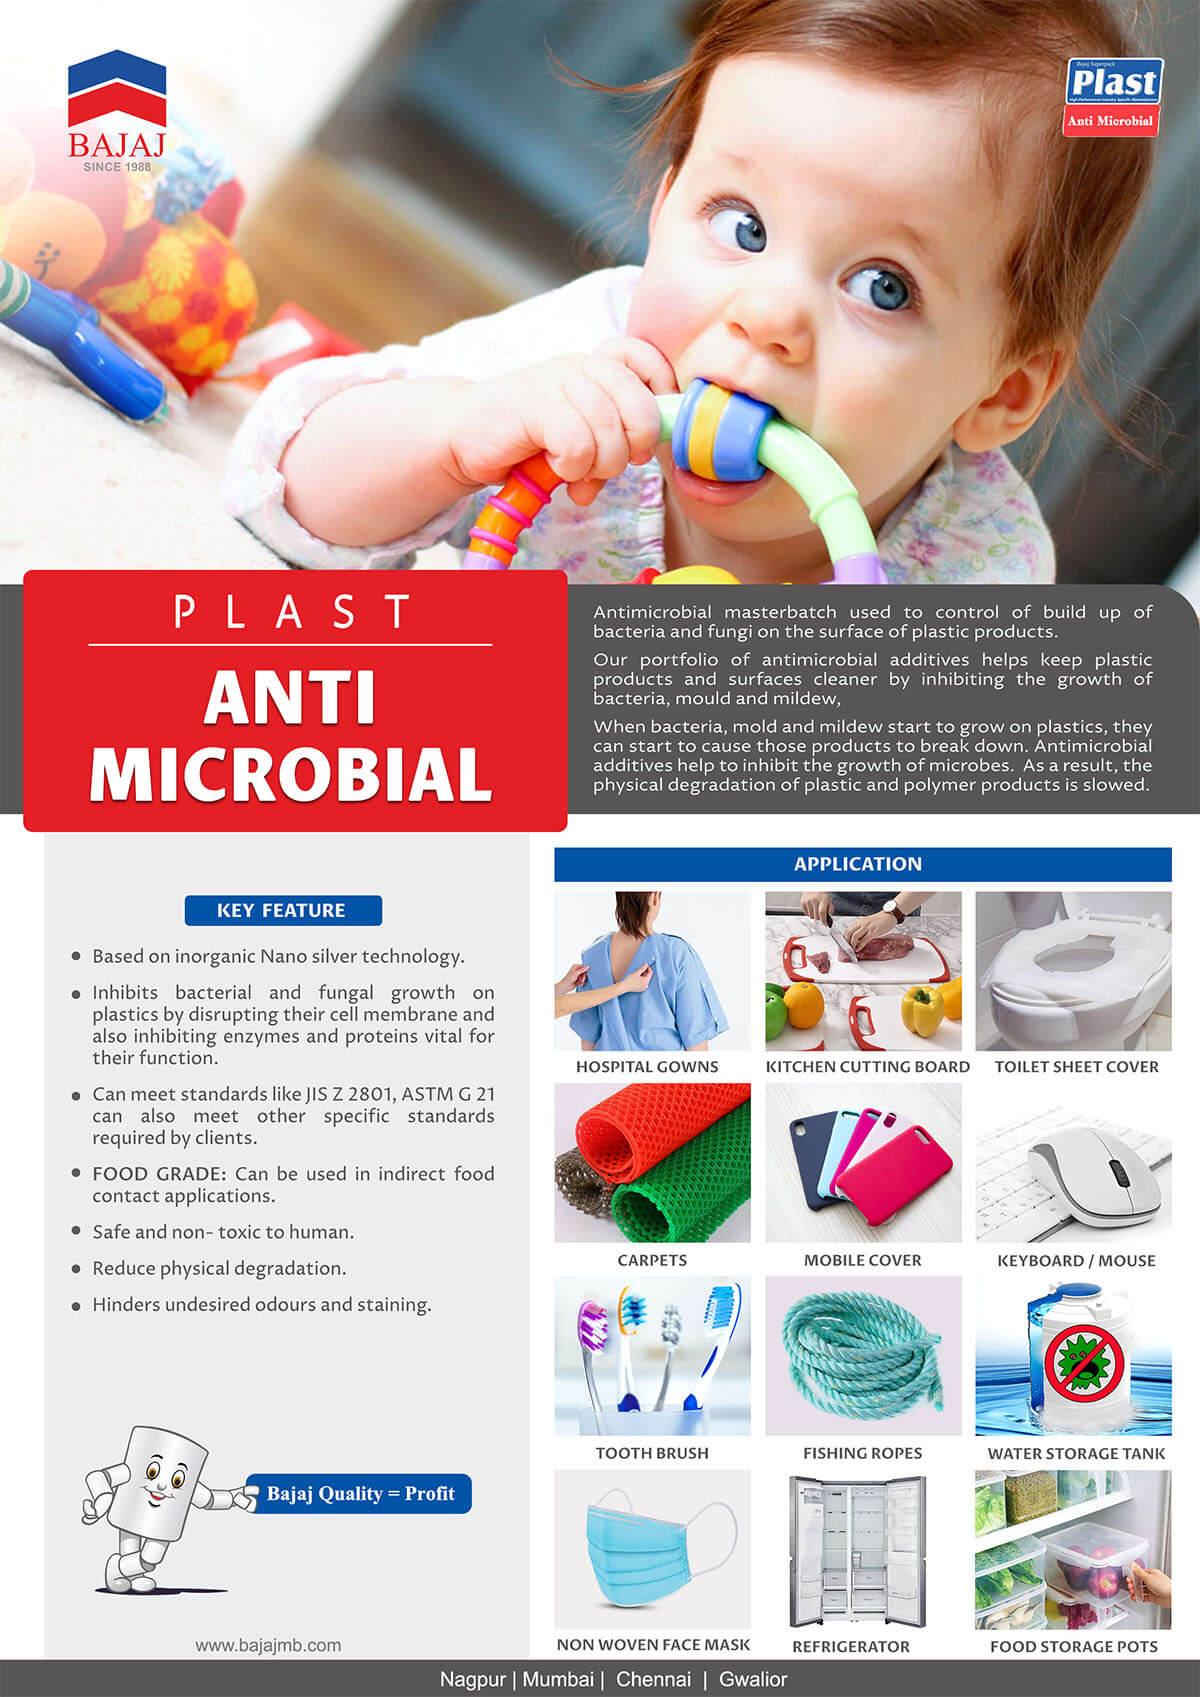 Plast Anti Microbial - Masterbatches Application